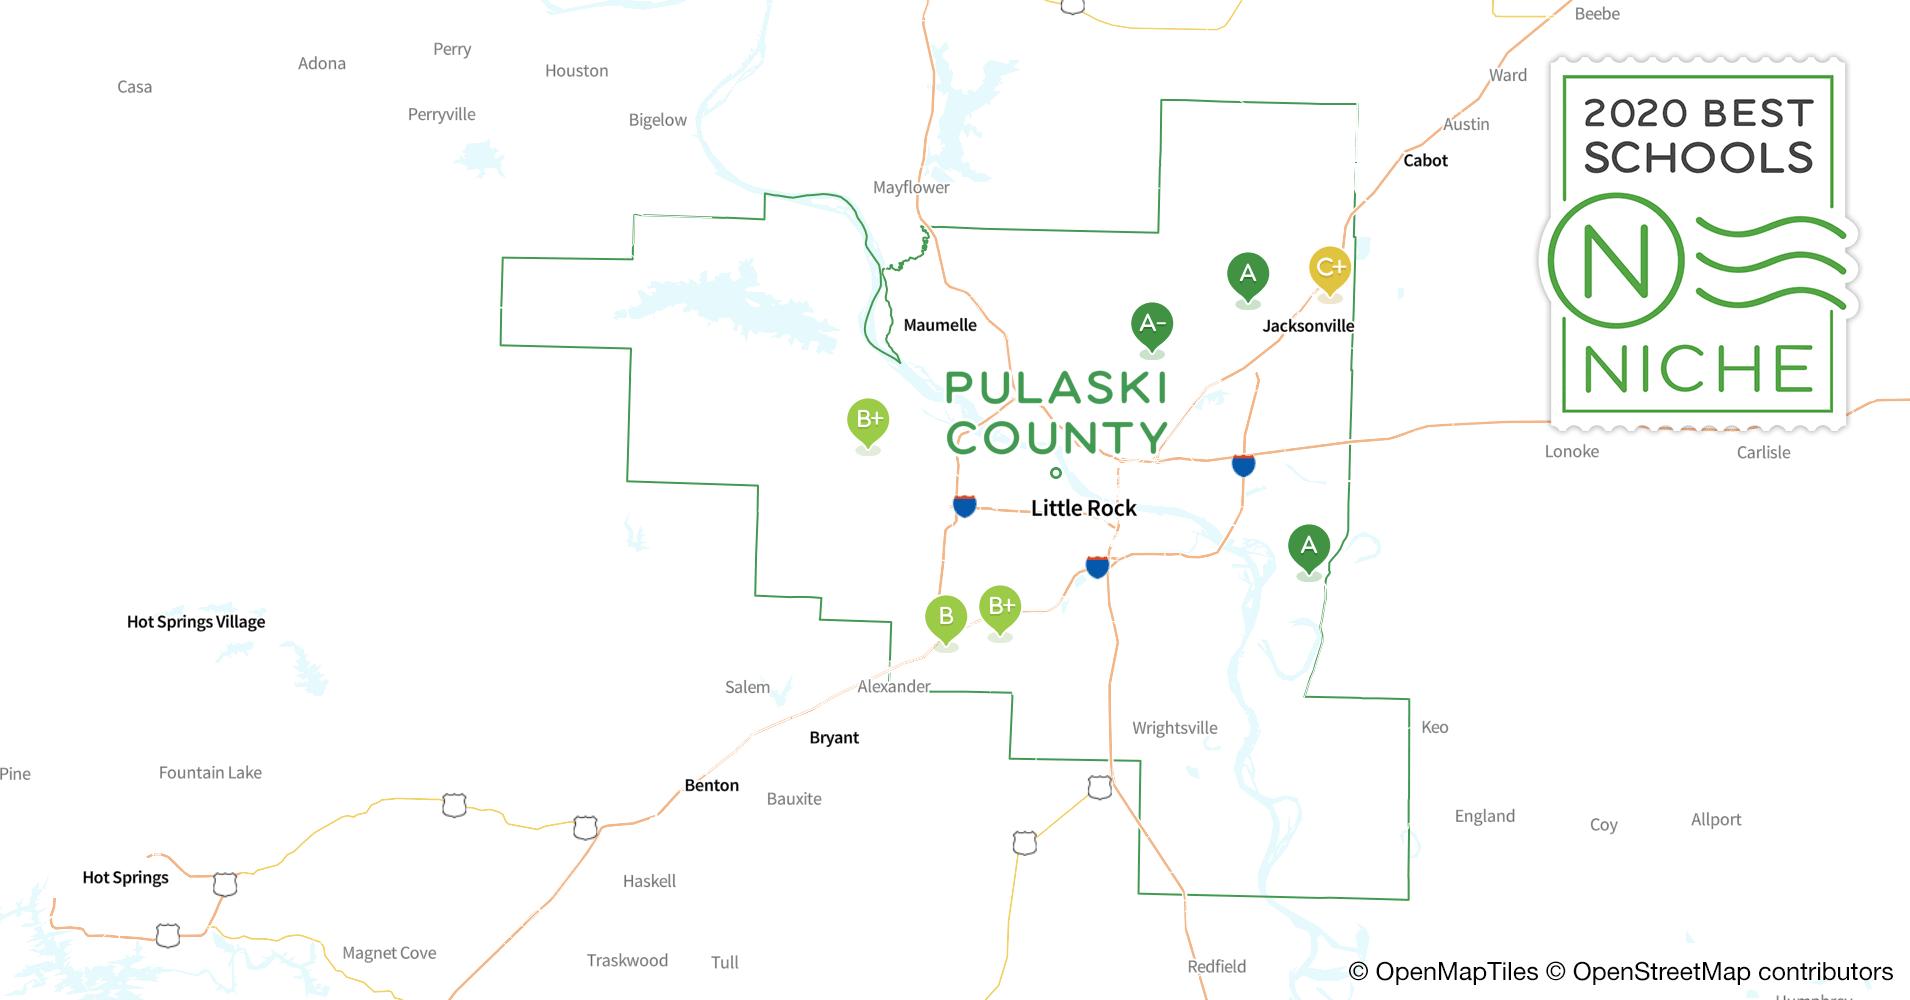 School Districts in Pulaski County, AR - Niche